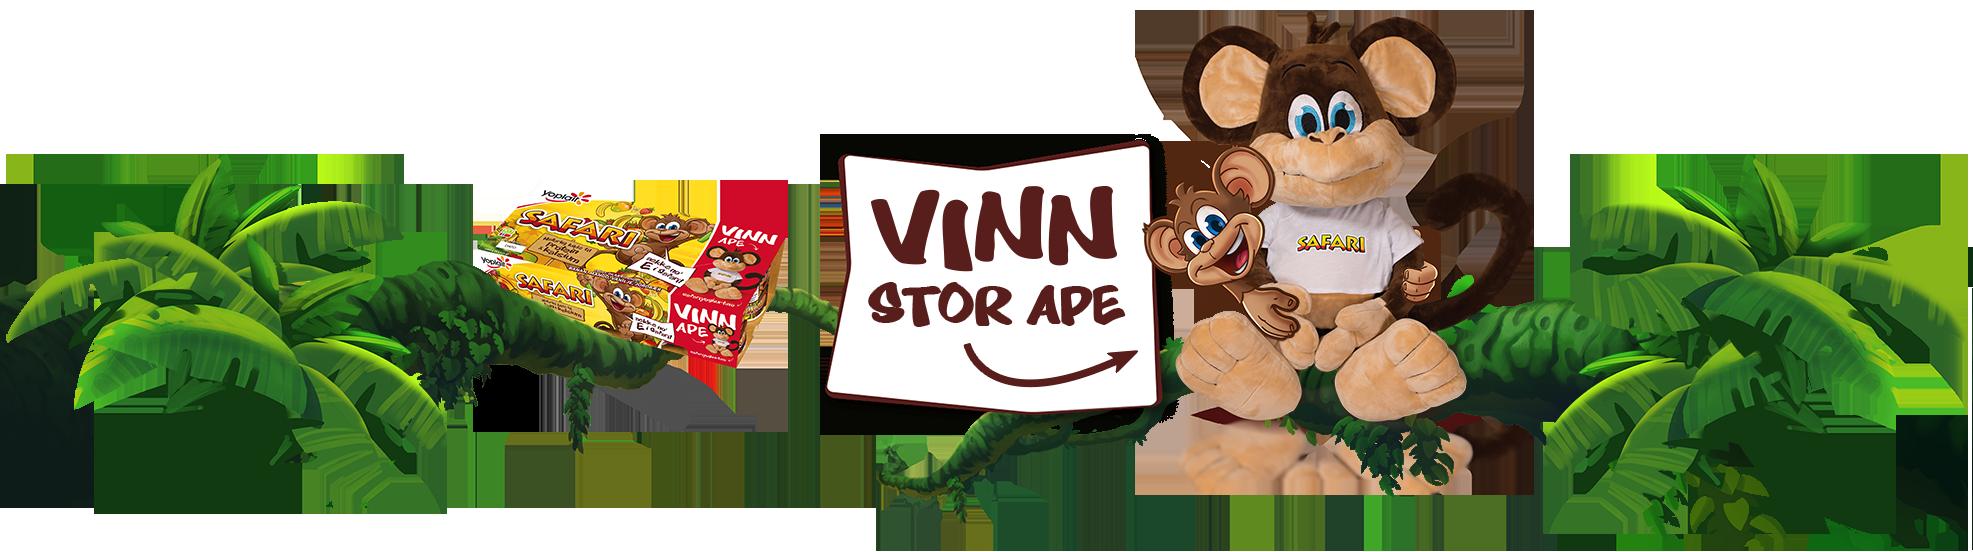 Vinn SAFARI-ape